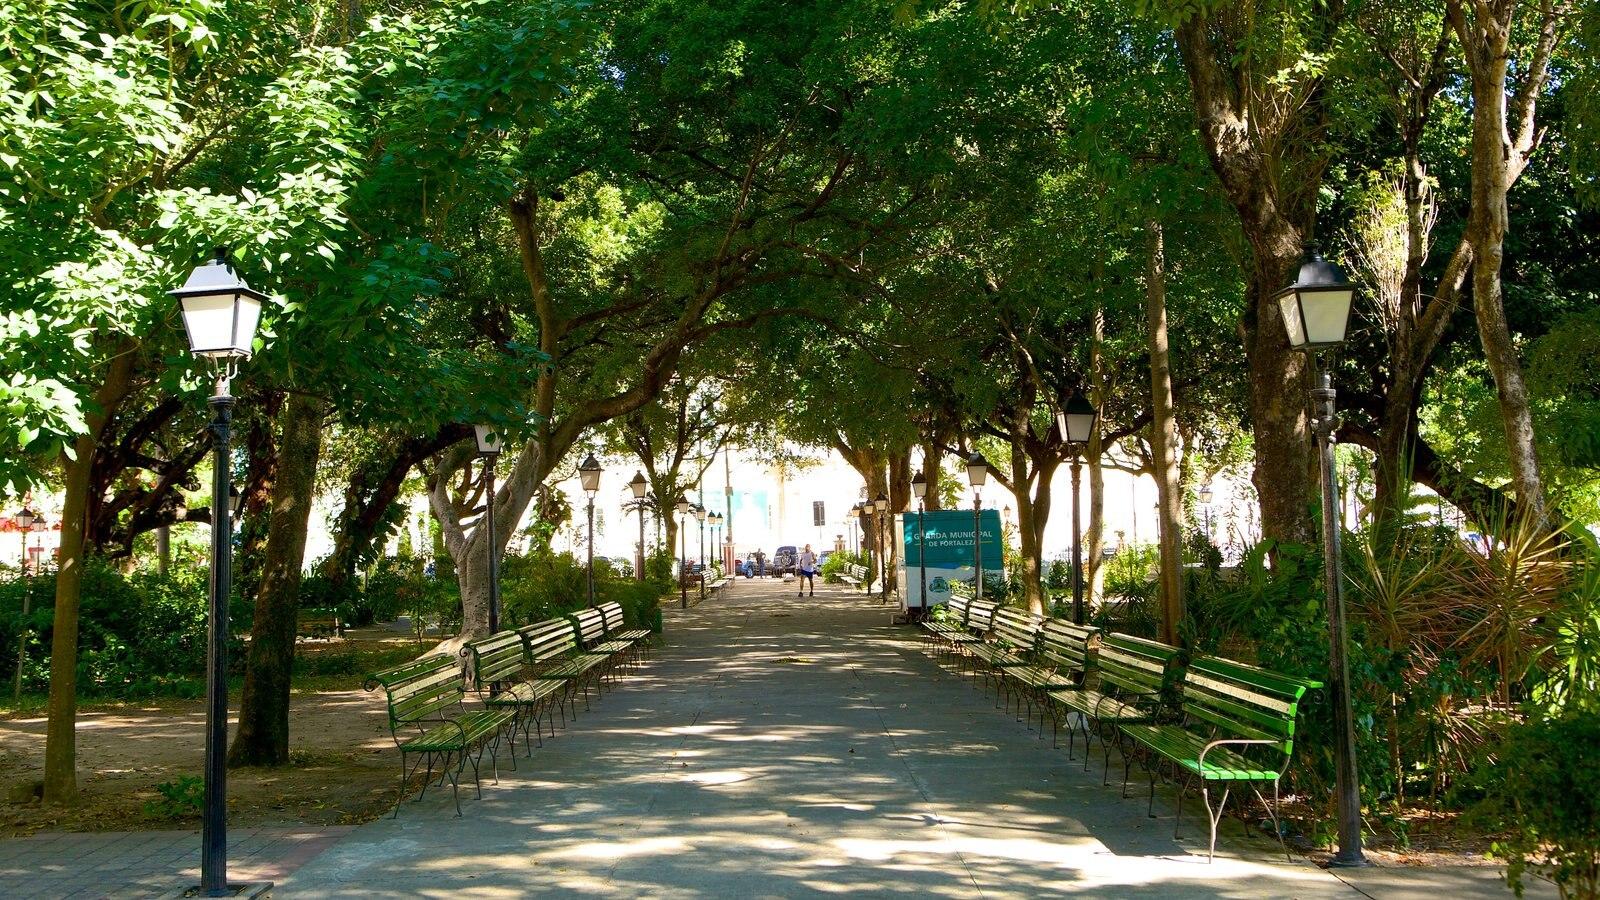 Passeio Público que inclui um jardim